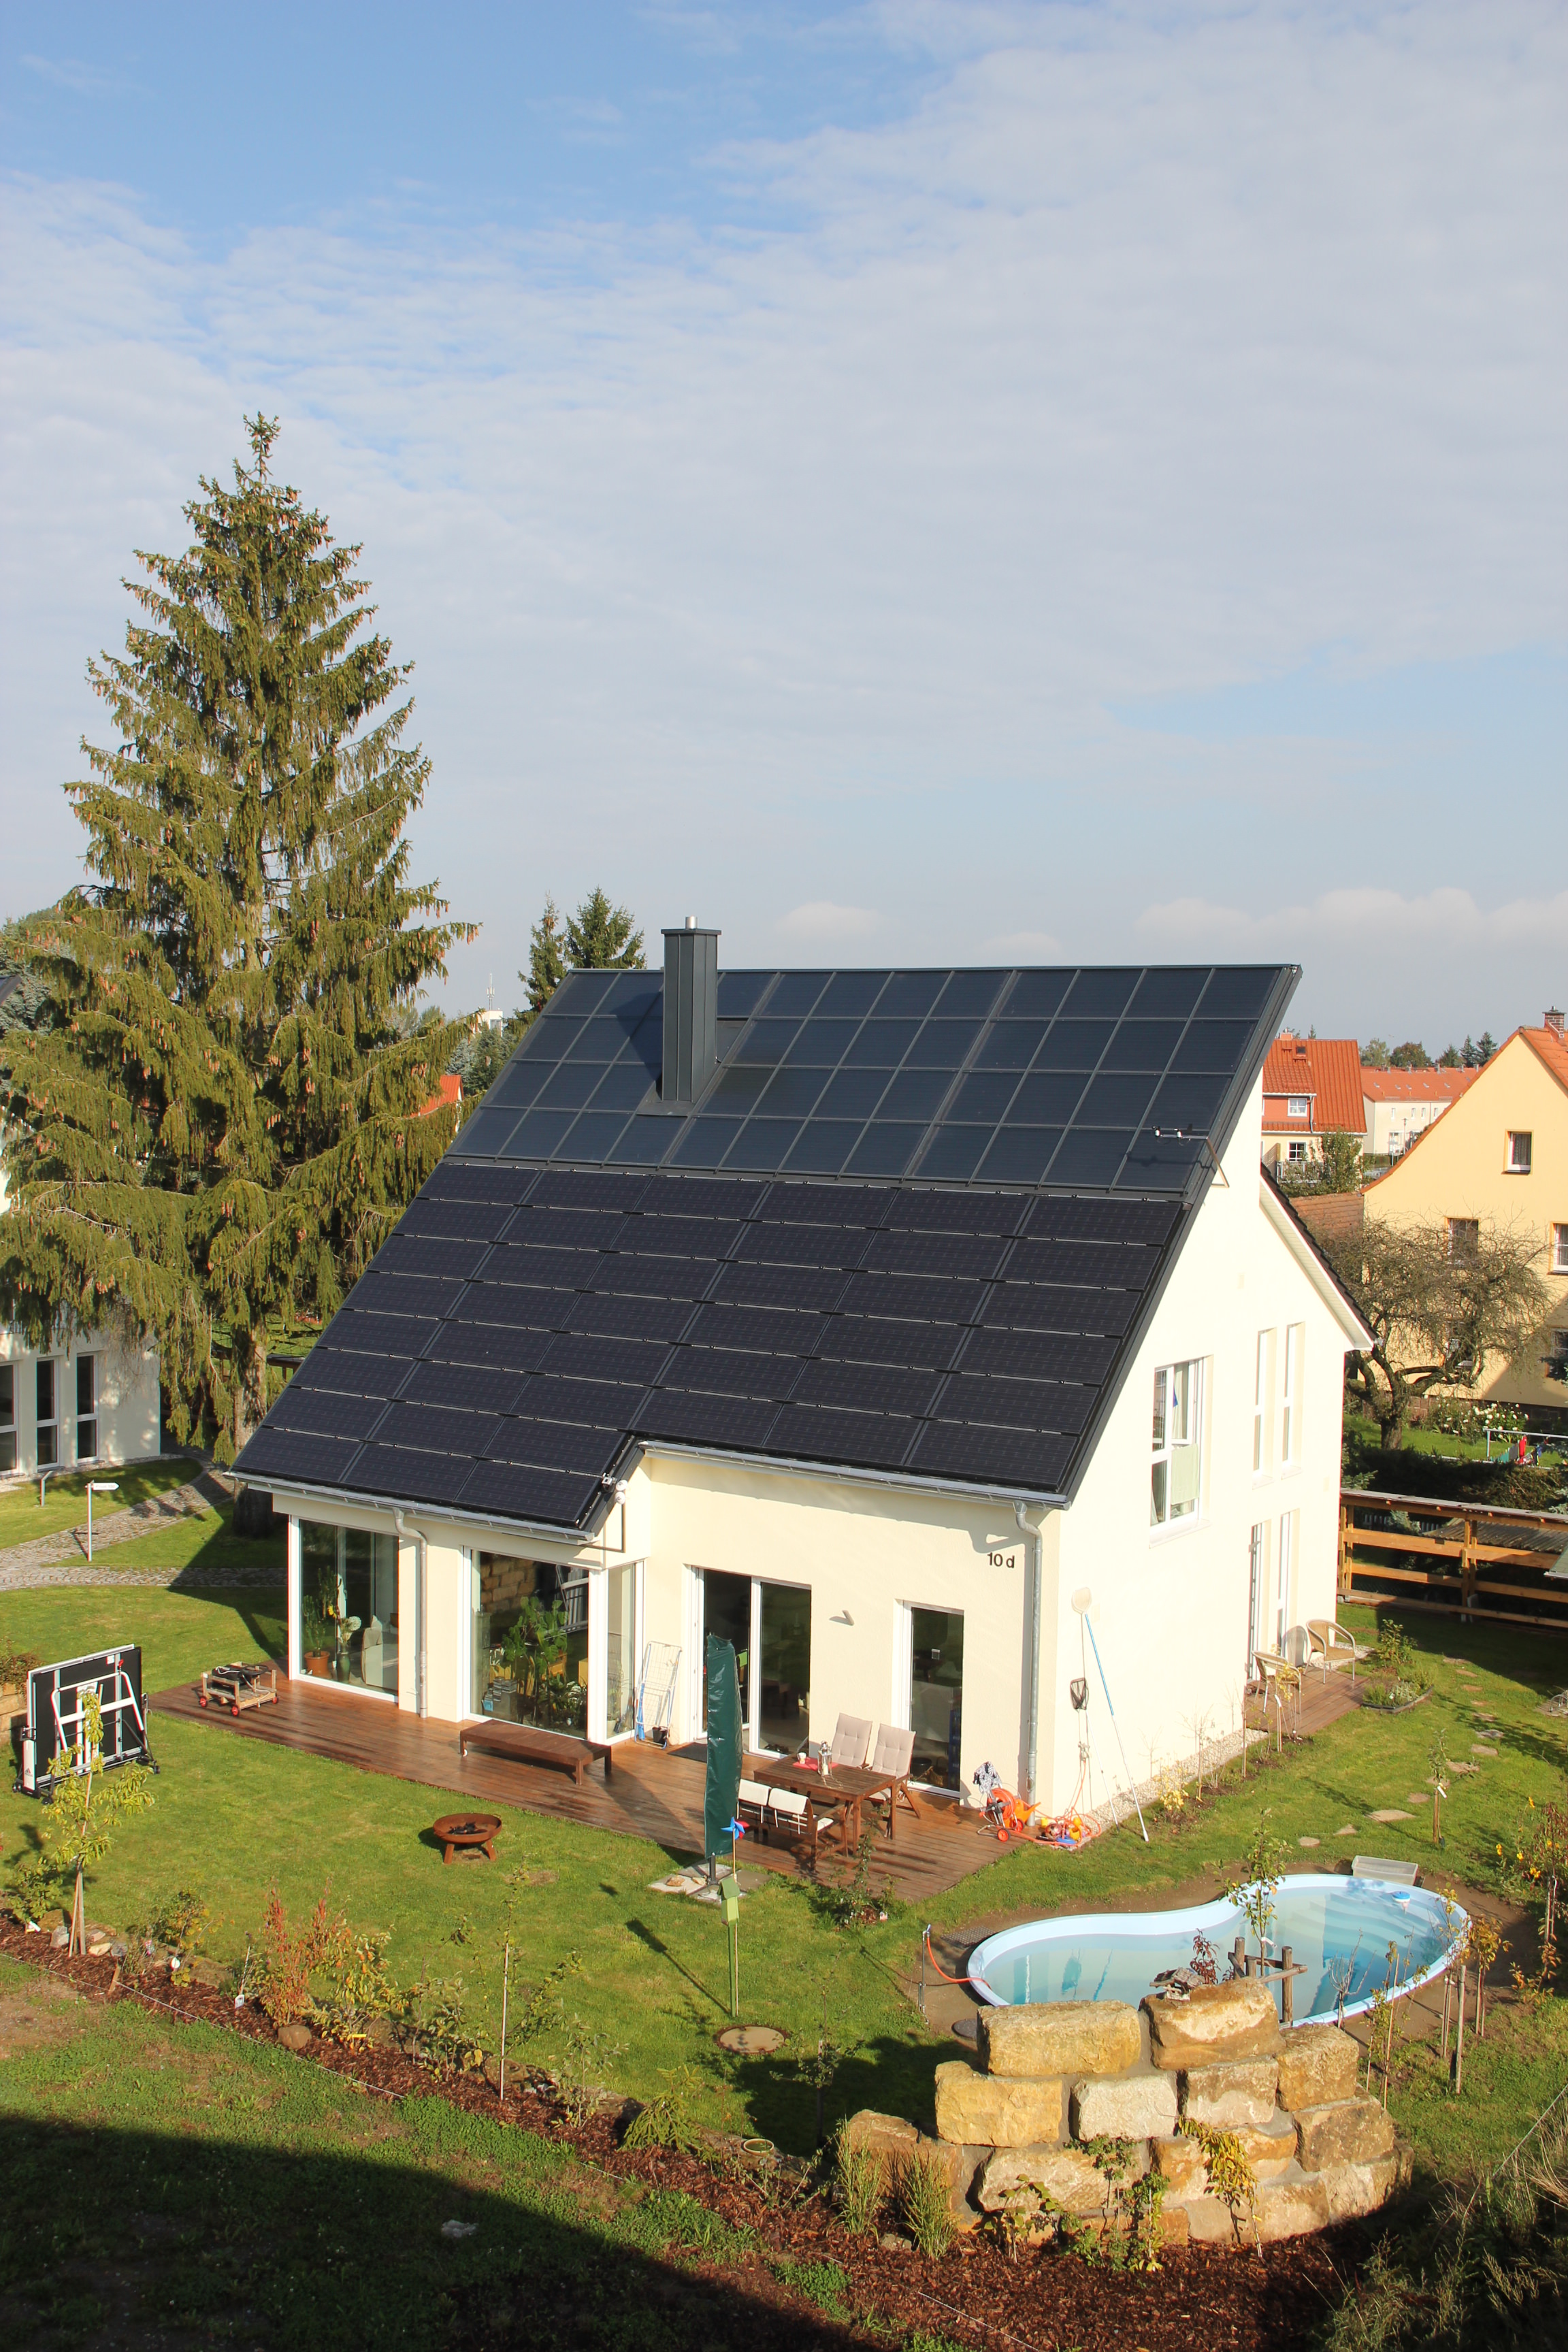 Elektrische Standard Einfamilienhaus - sohoart.co - Idee e immagini ...